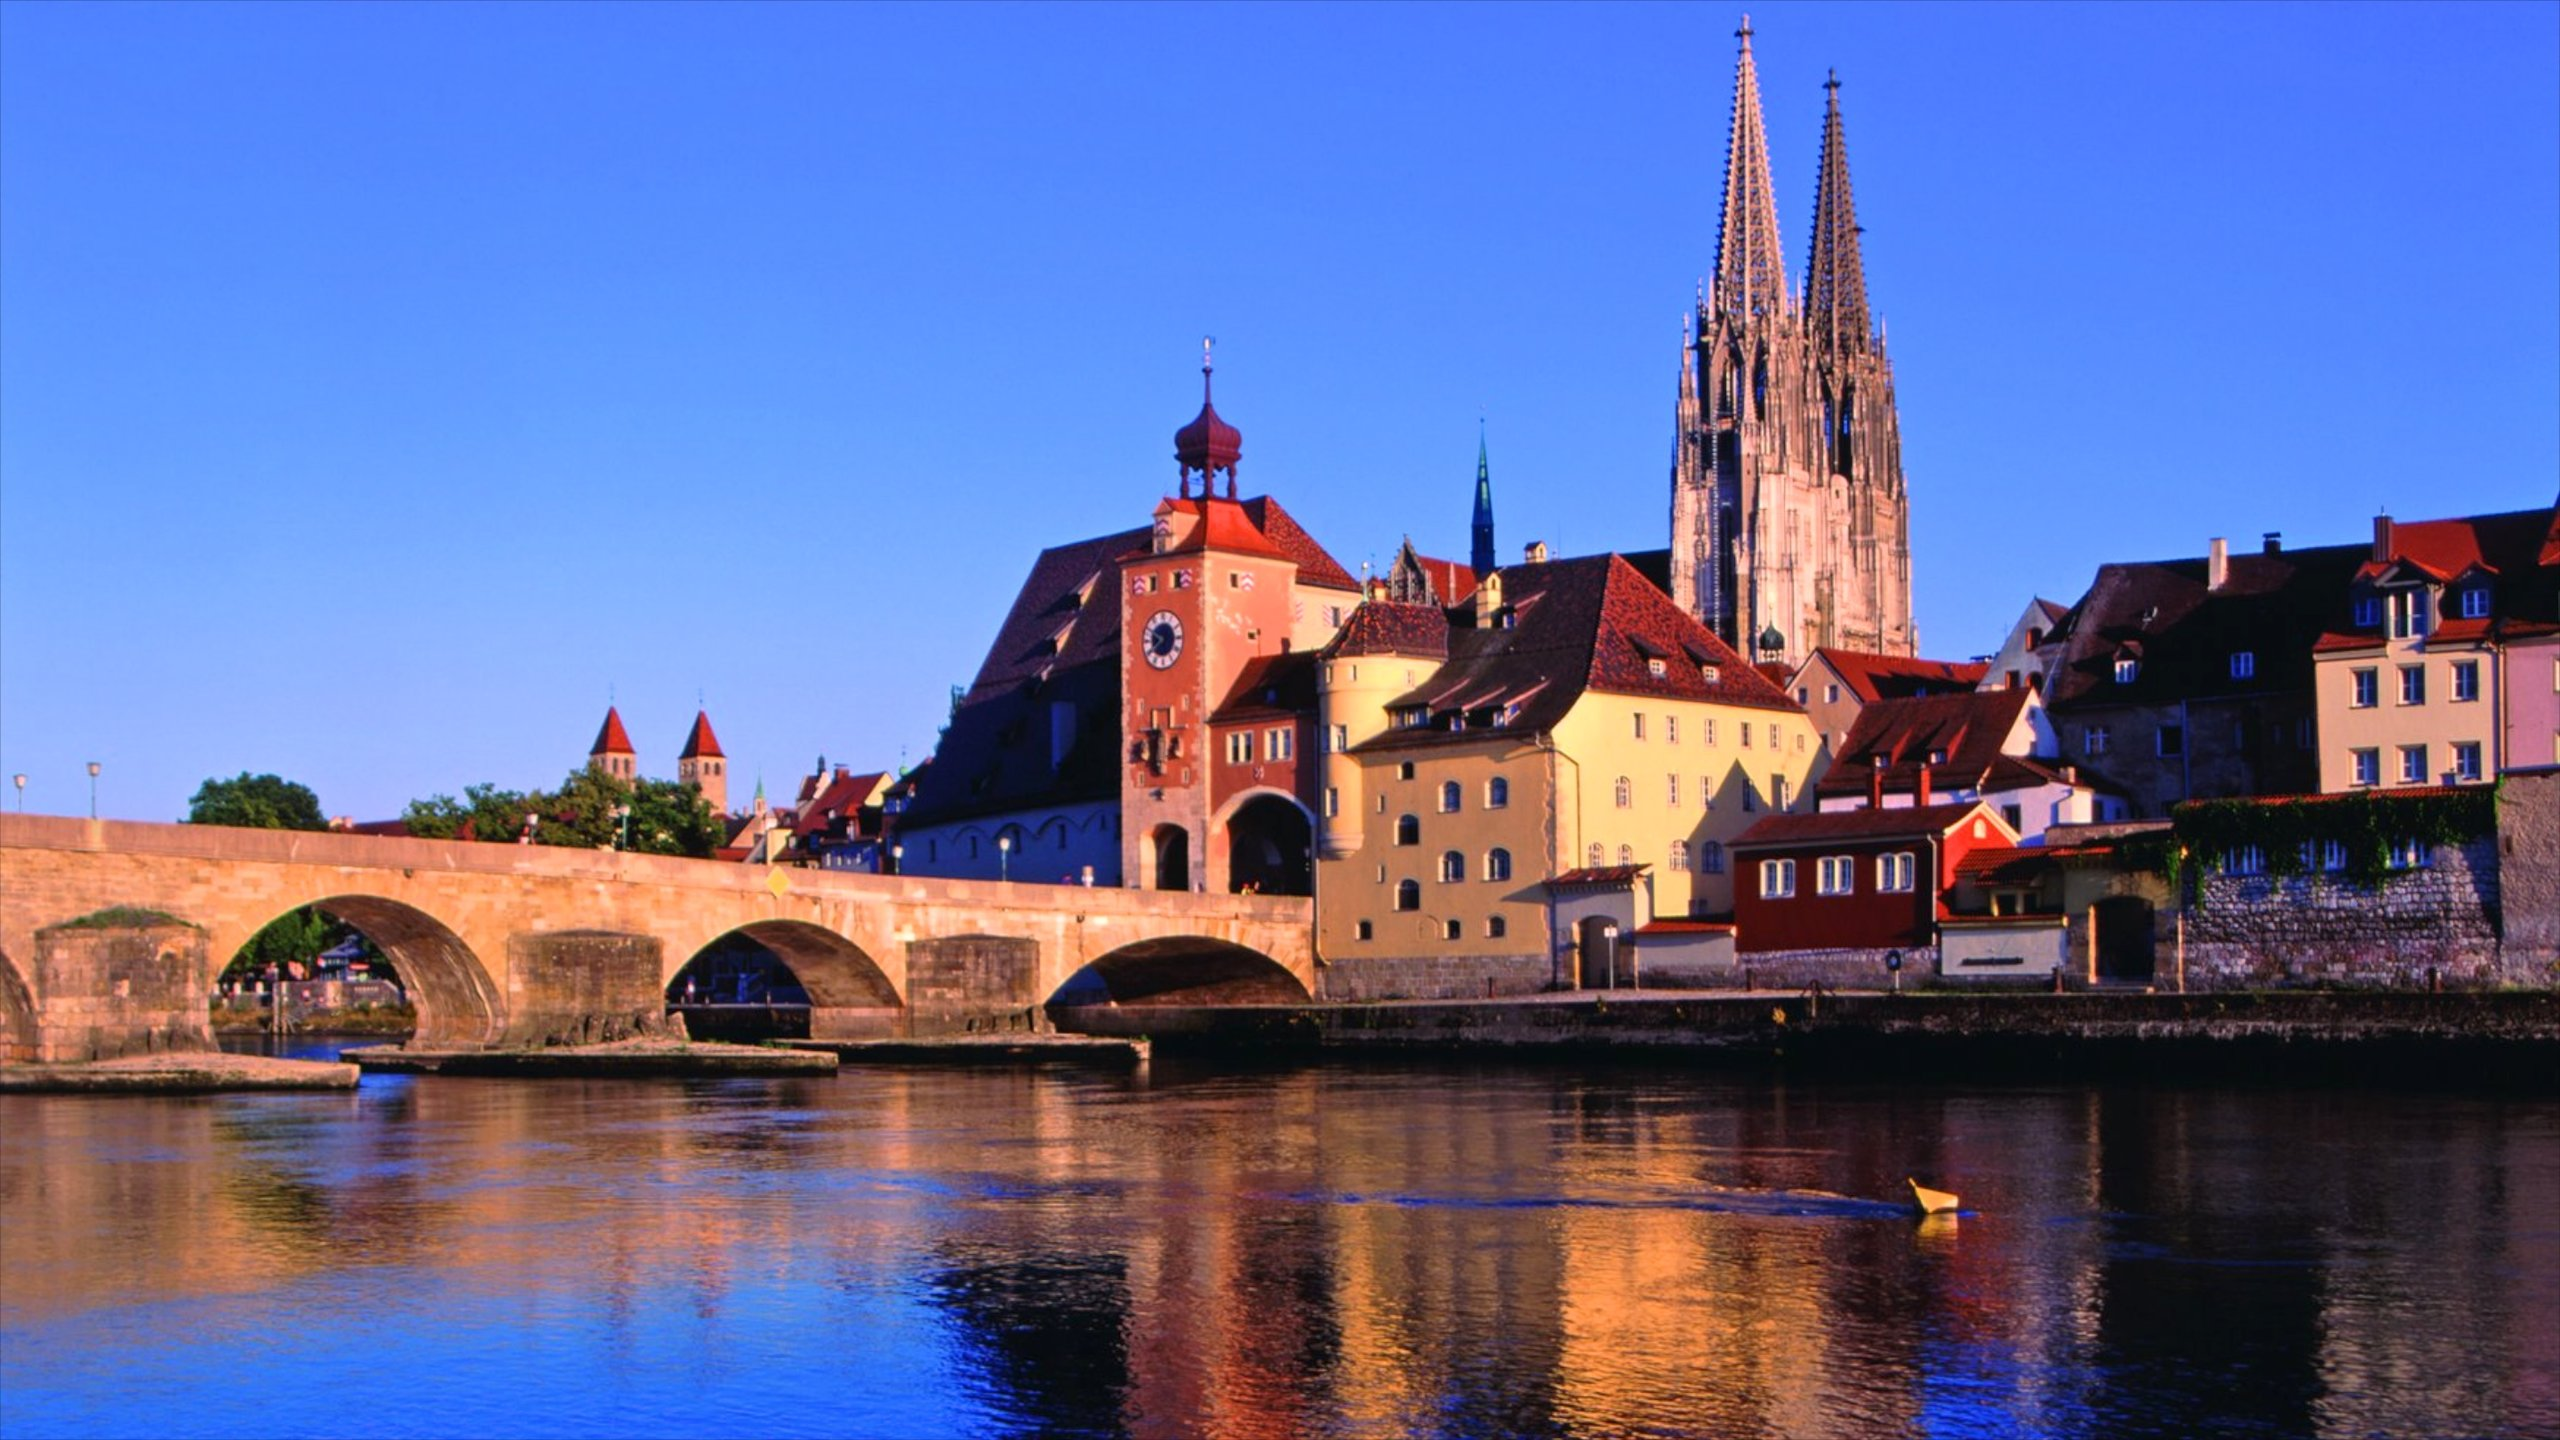 Stone Bridge, Regensburg, Bavaria, Germany